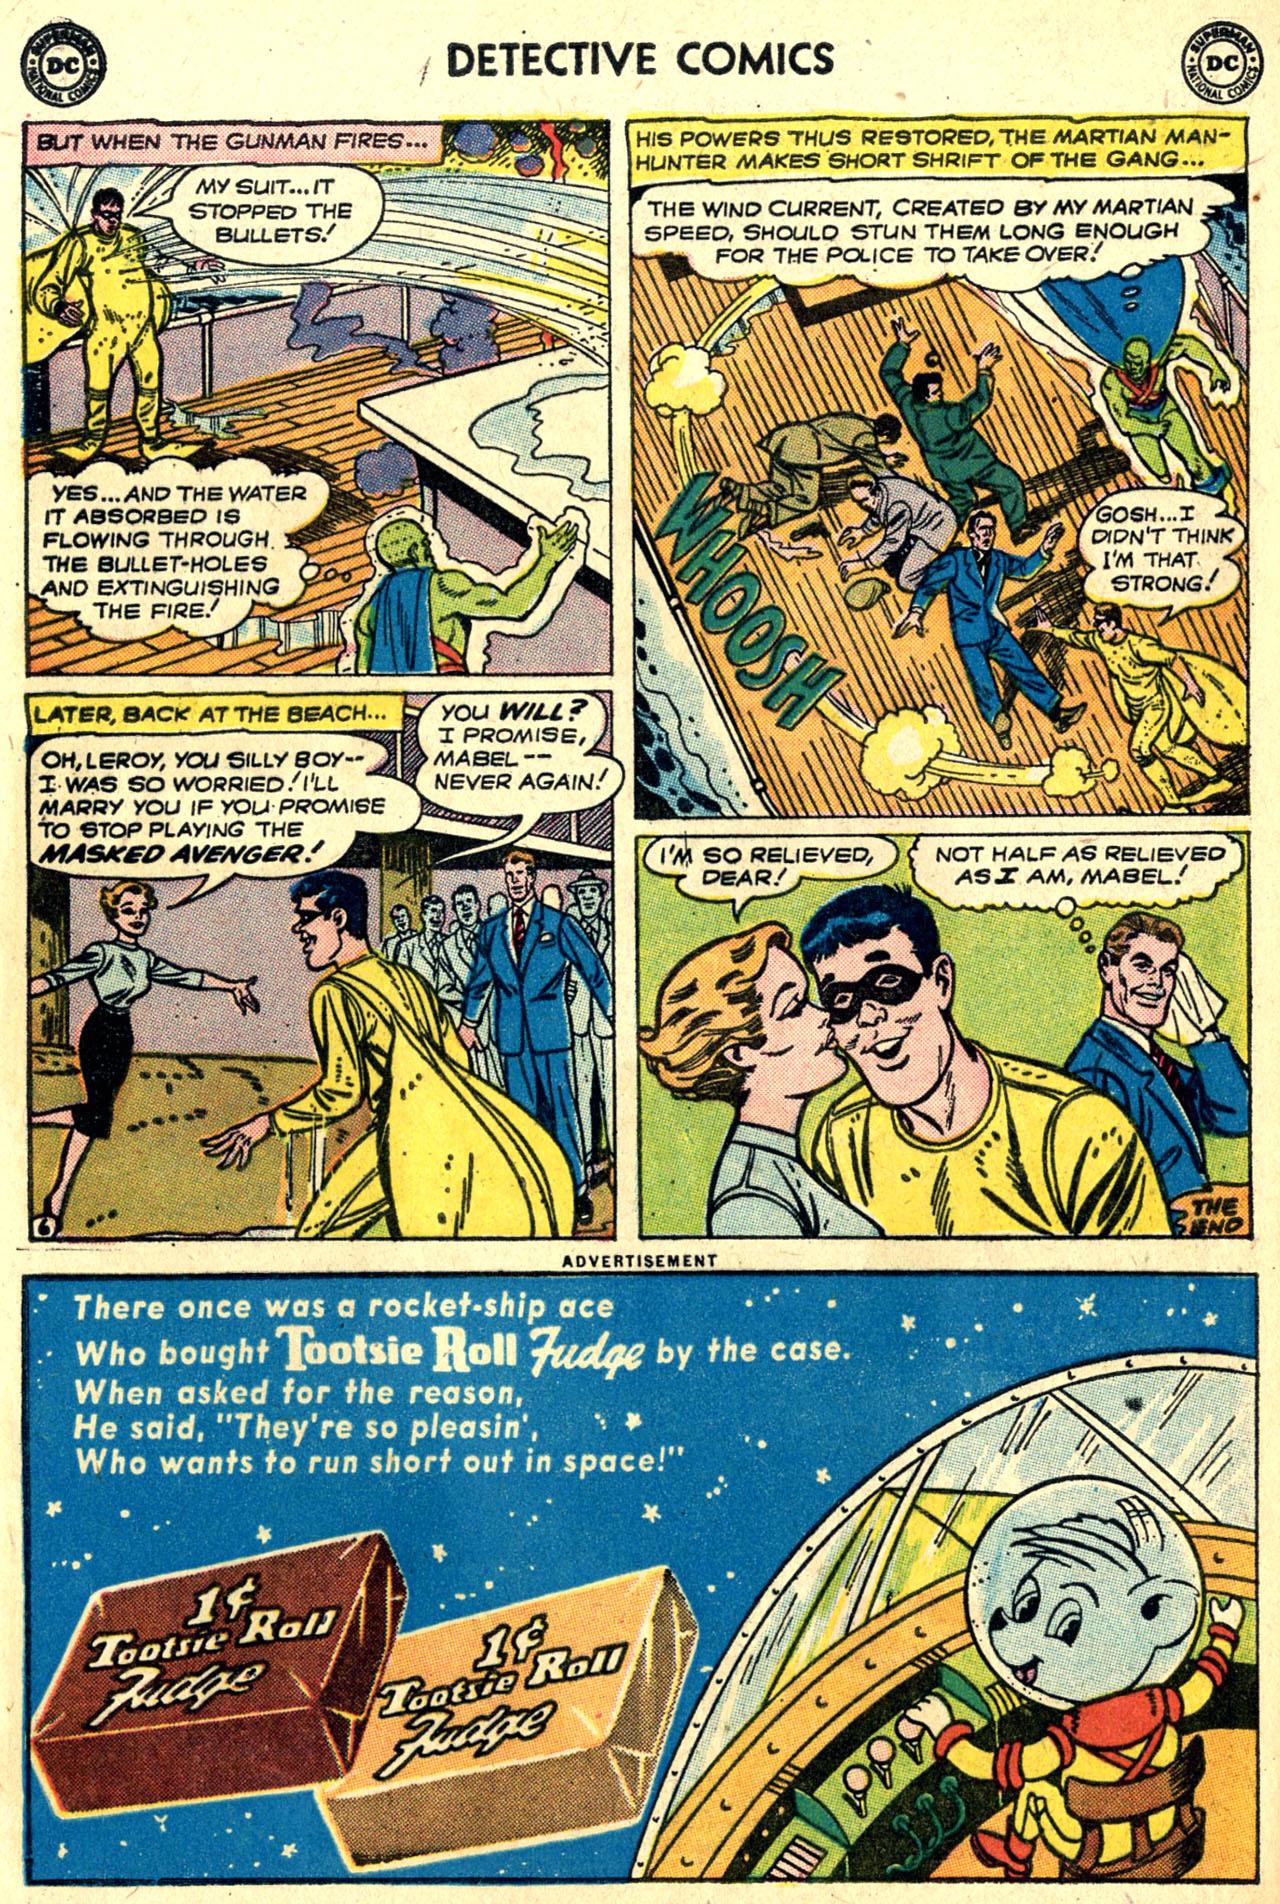 Detective Comics (1937) 266 Page 31